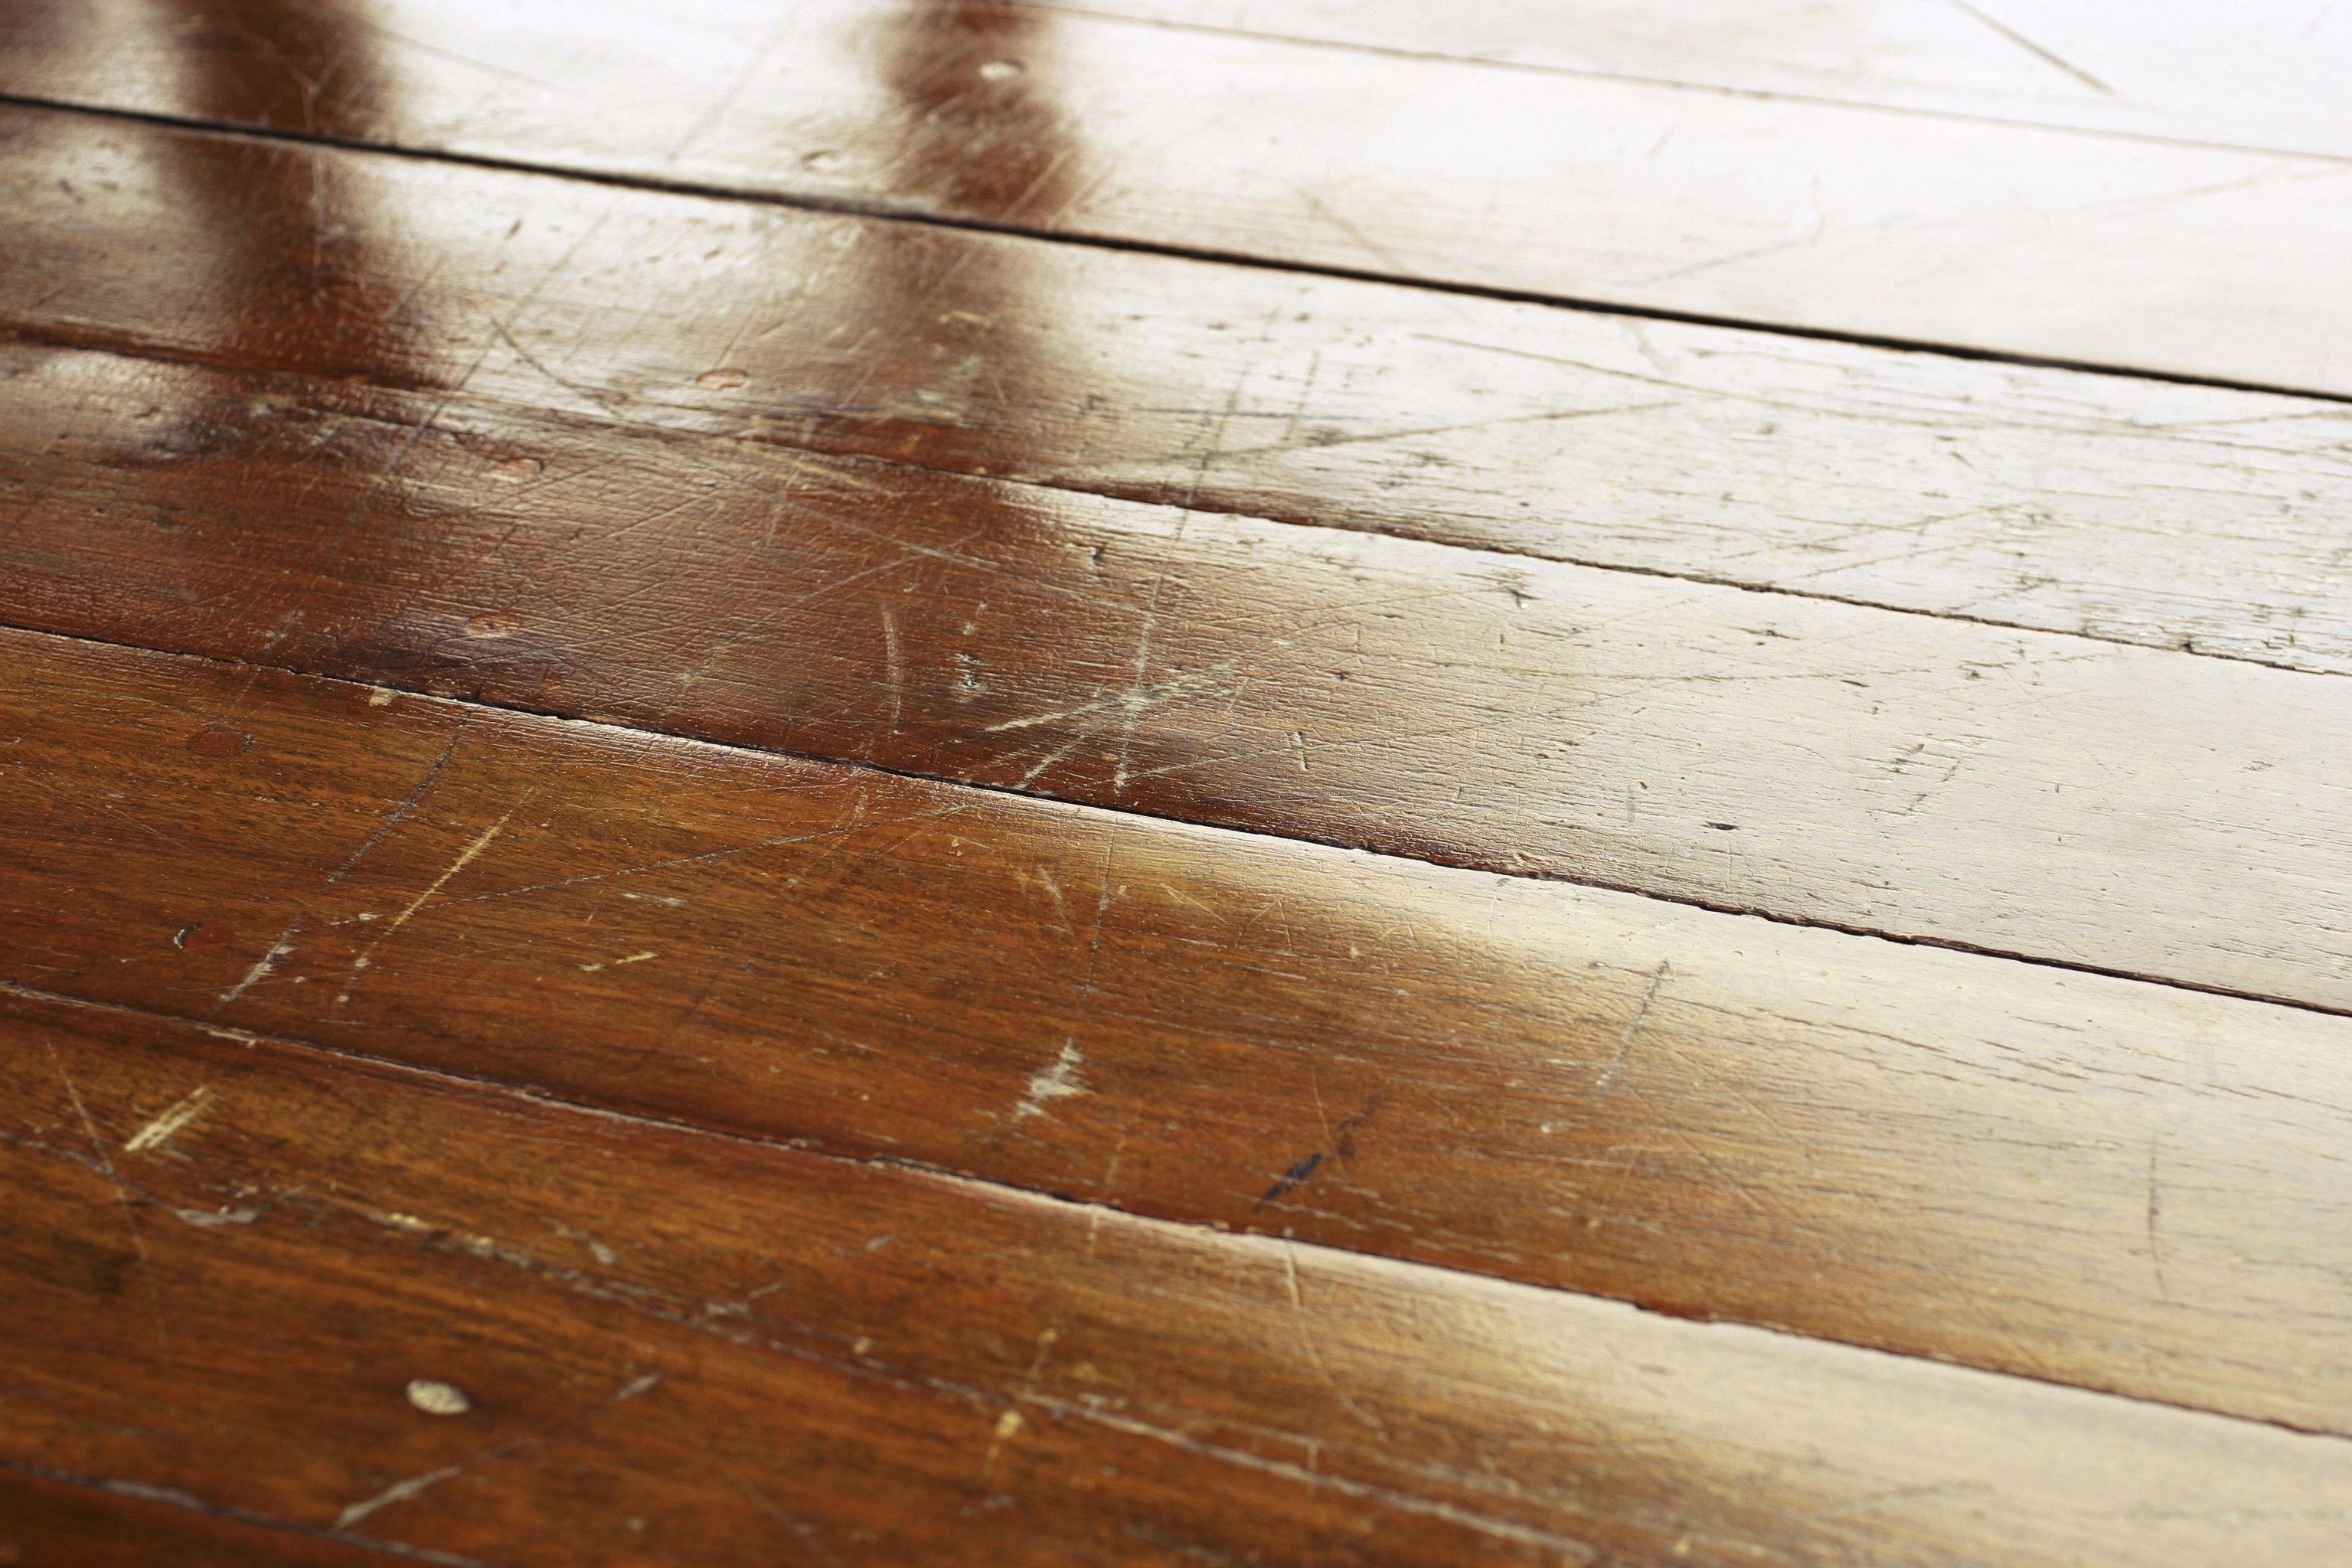 Bamboo Floors And Dogs Hardwood Floor Scratches Wood Floor Repair